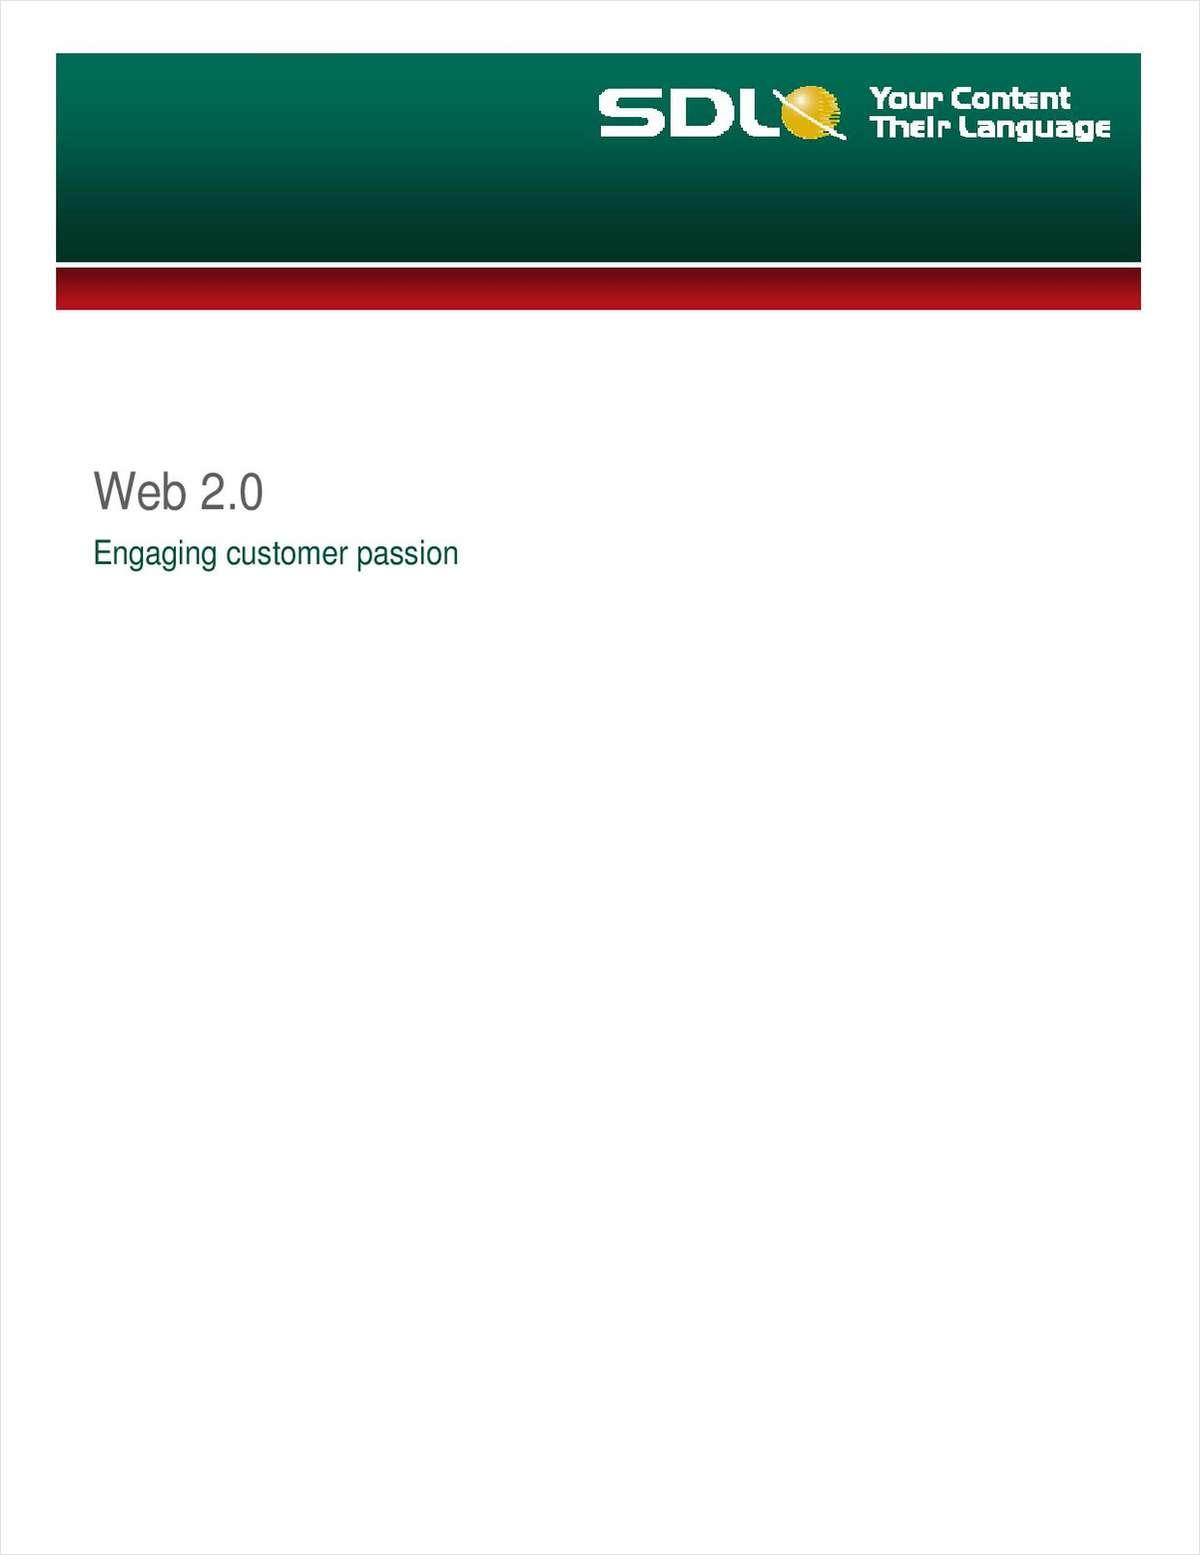 Web 2.0: Engaging Customer Passion